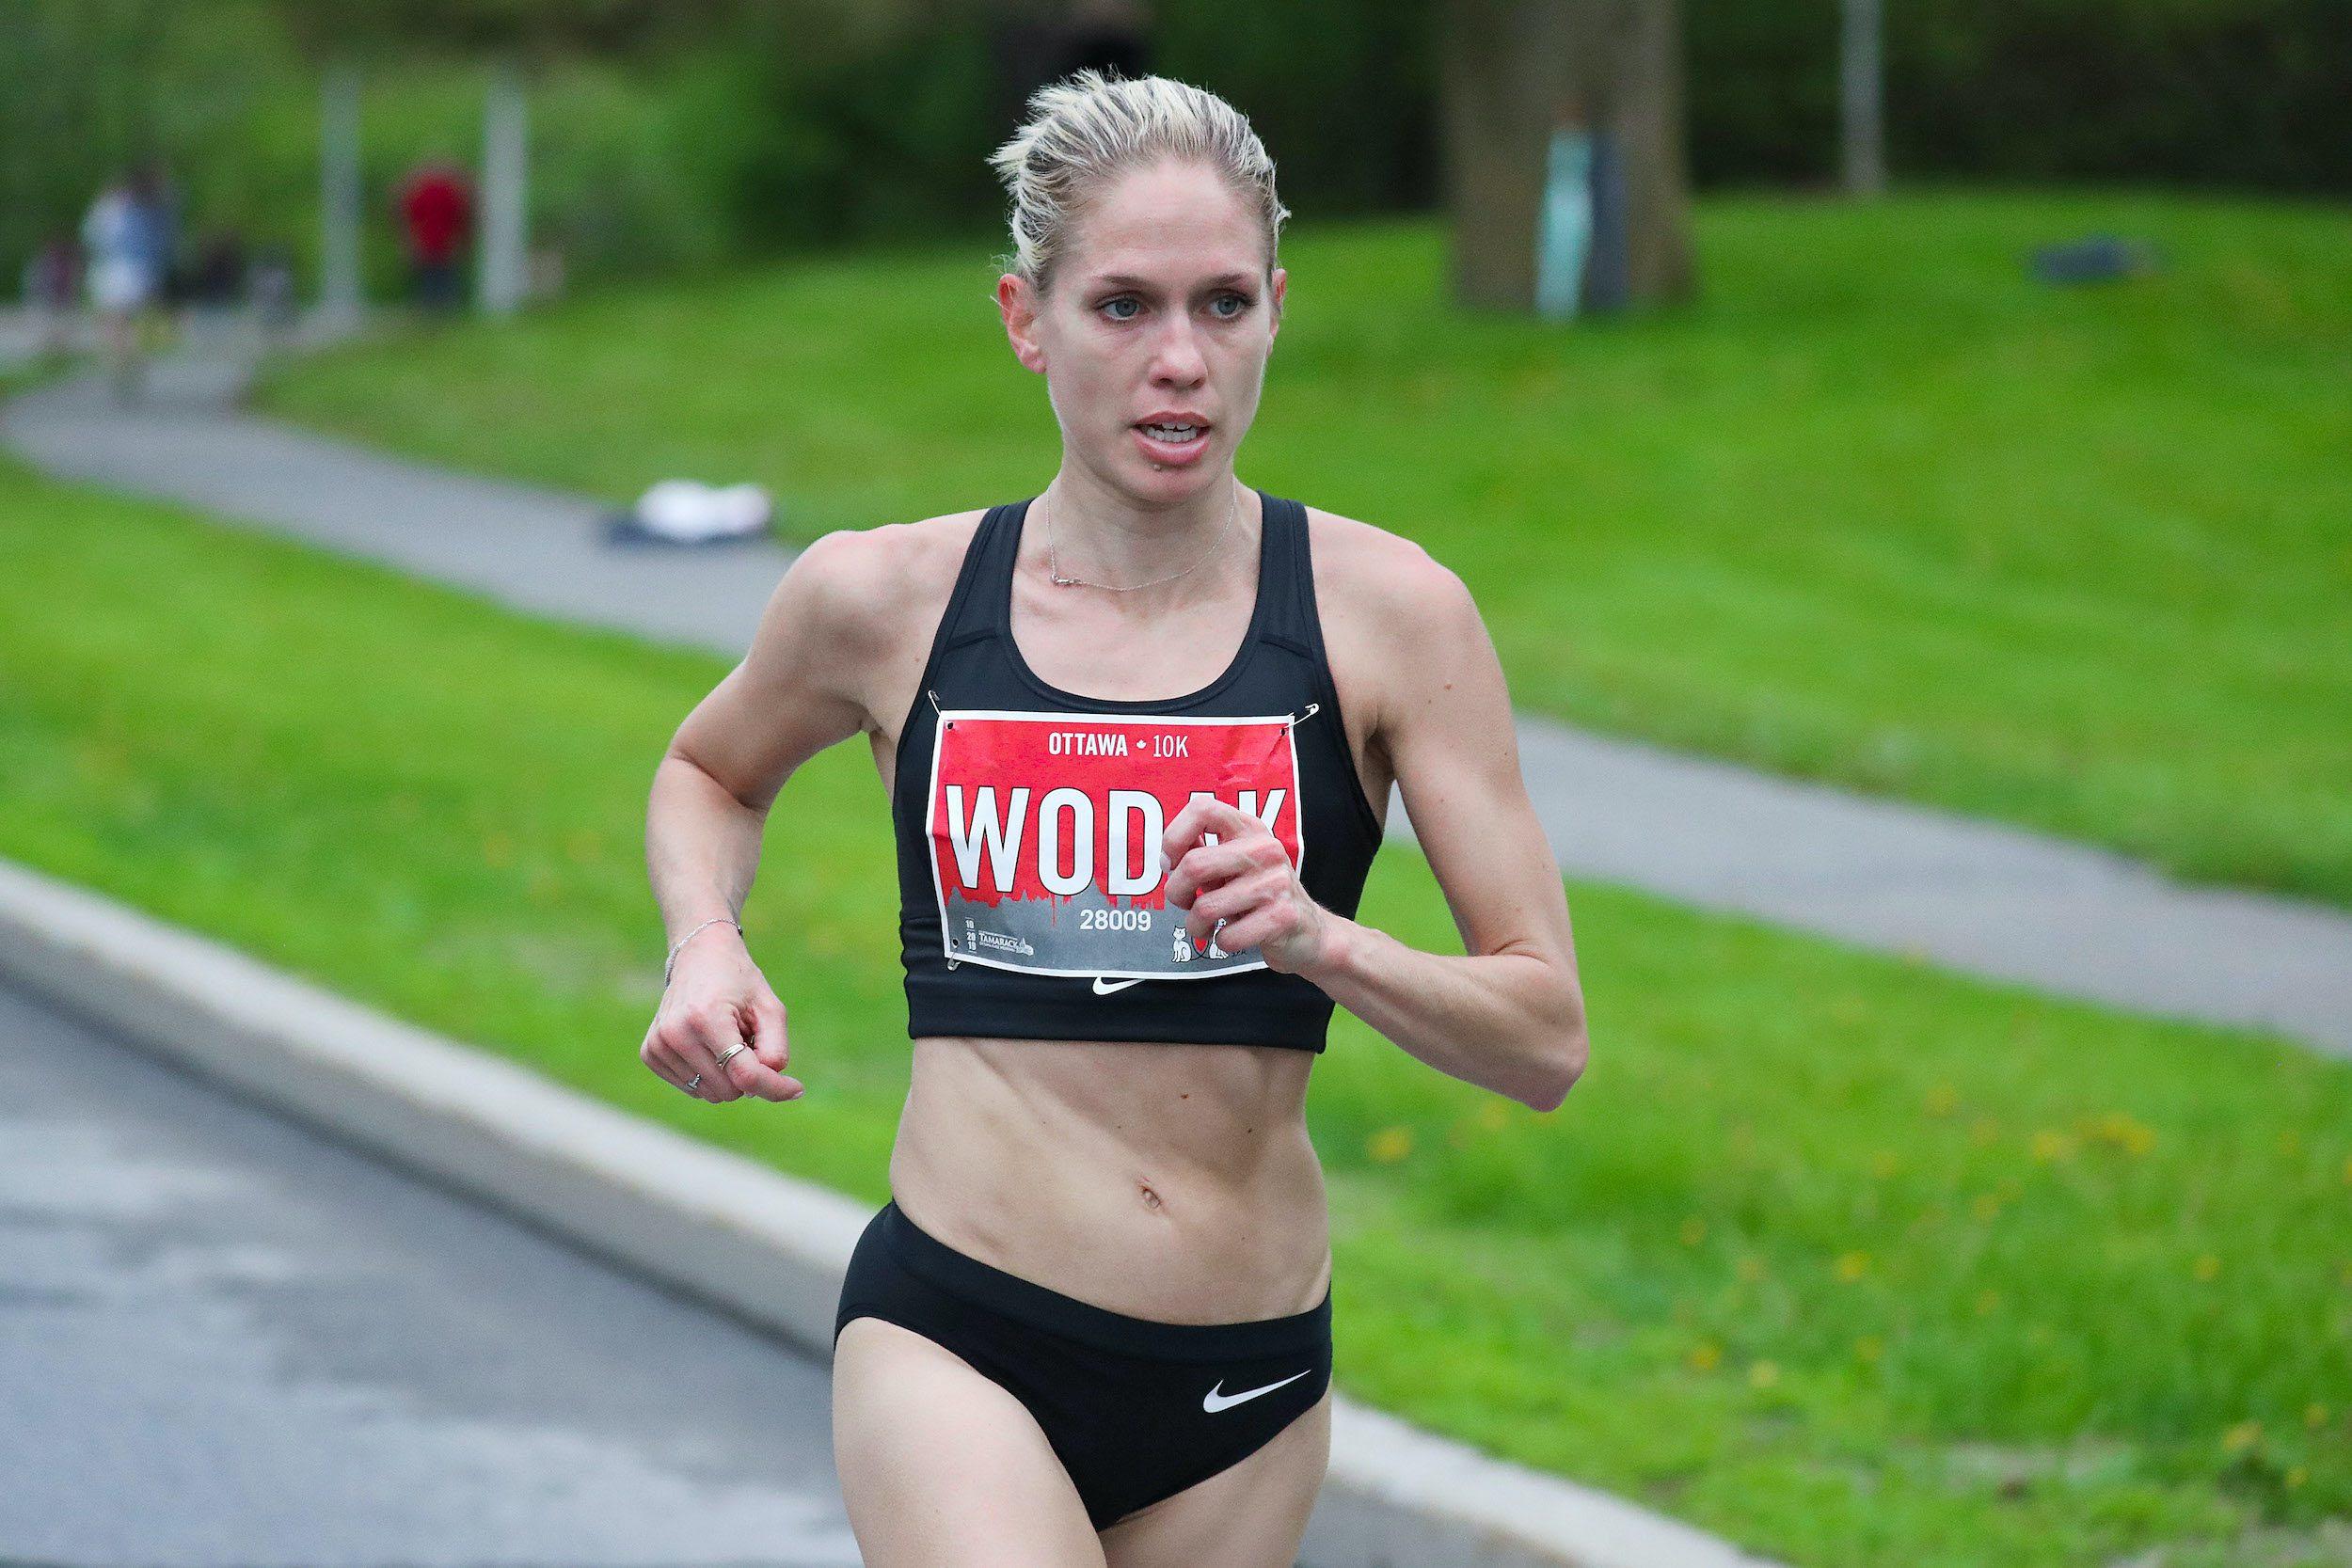 Canadian Olympians headline Scotiabank Toronto Waterfront Marathon 10K elite field